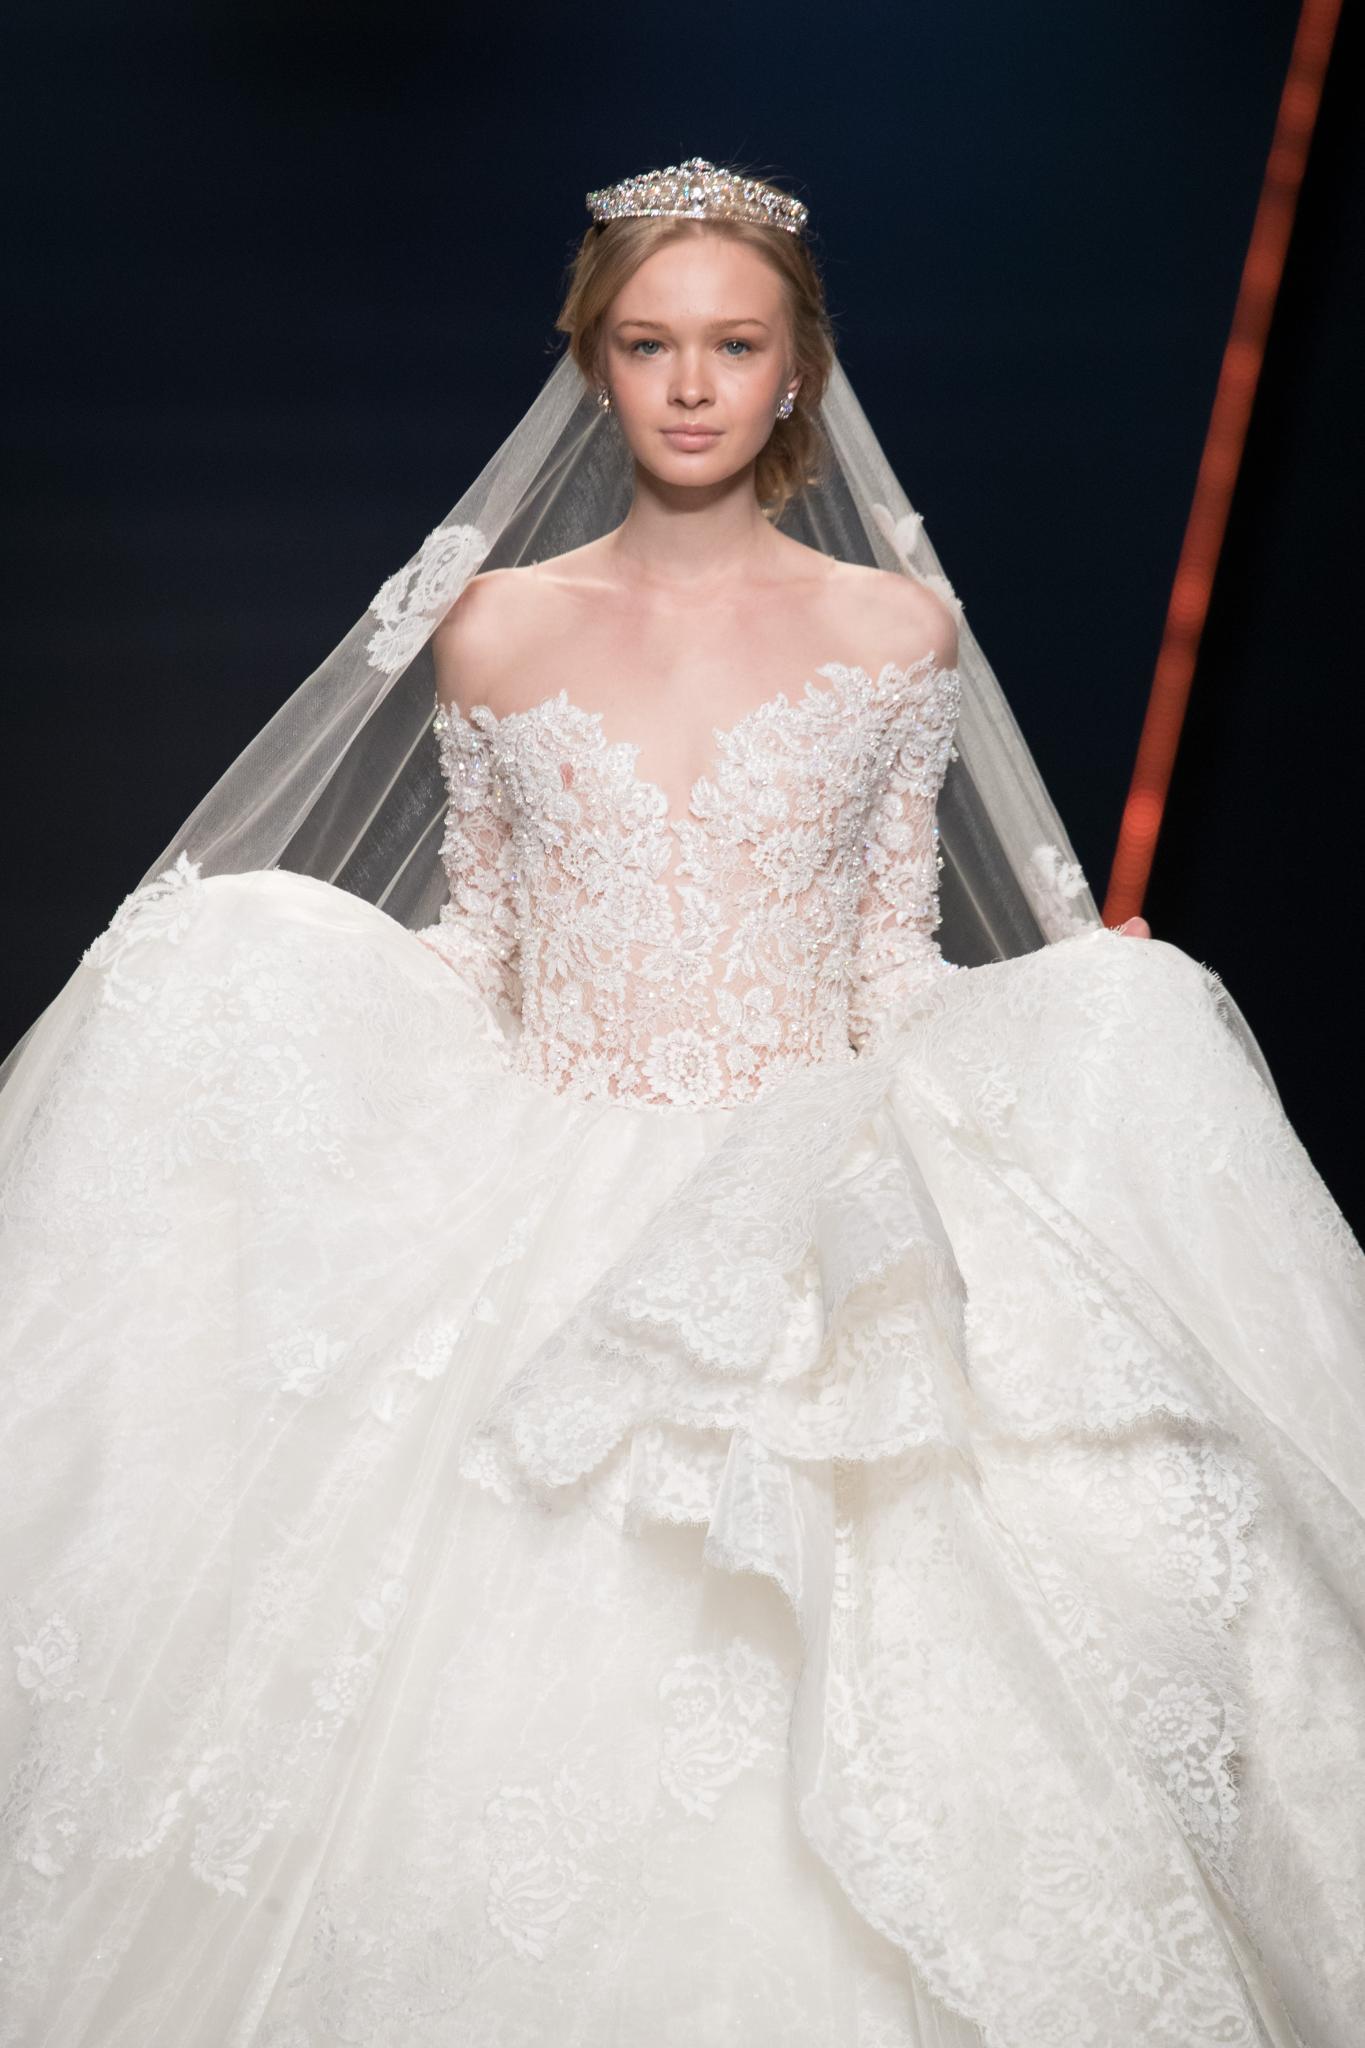 Peinado para boda recogido bajo pelo rubio con tiara corona amelia casablanca